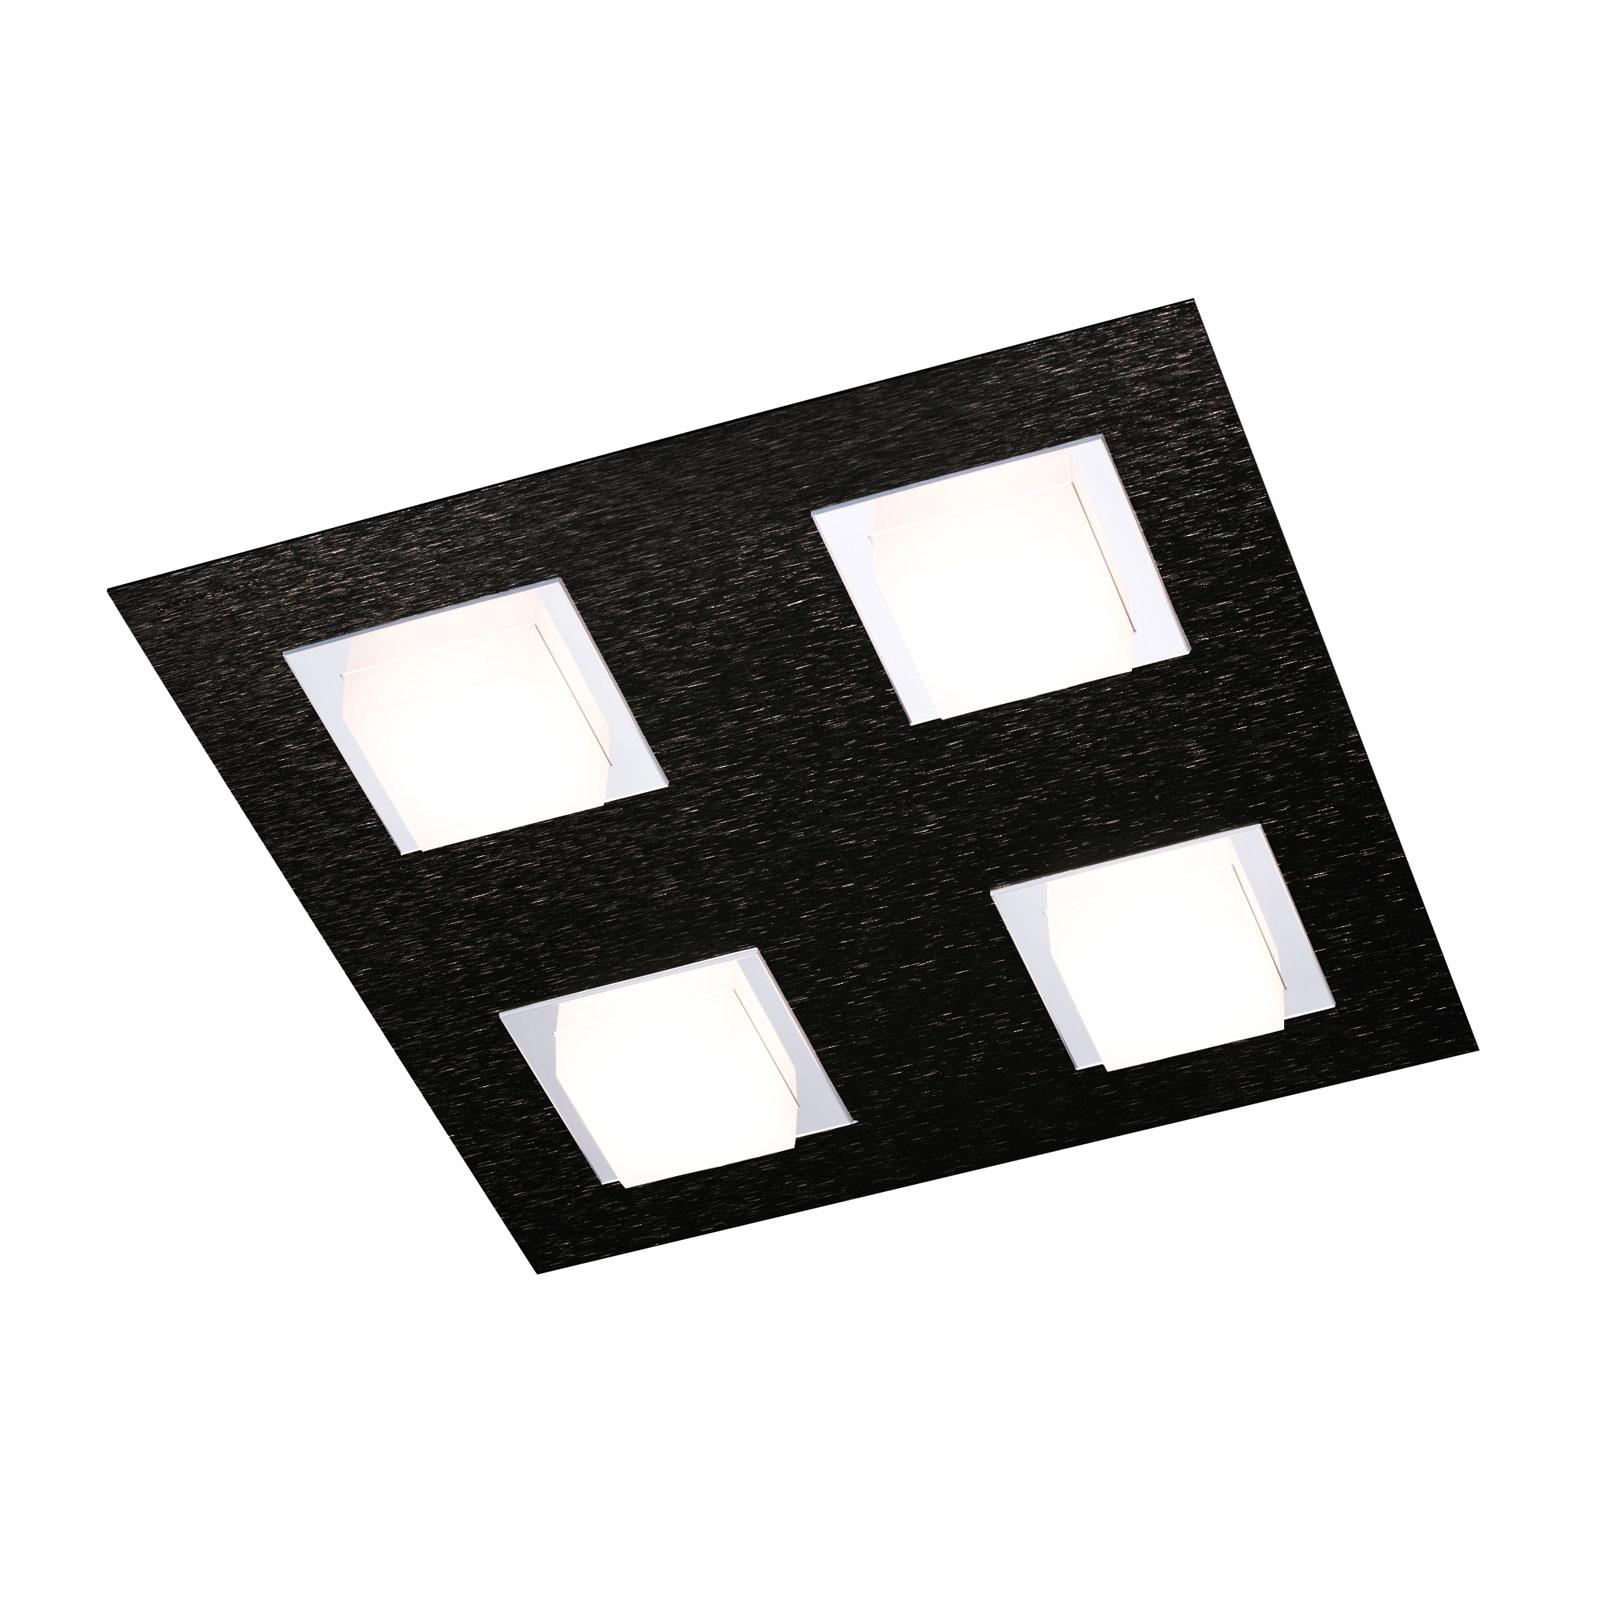 GROSSMANN Basic lampa sufitowa 4-punktowa czarna